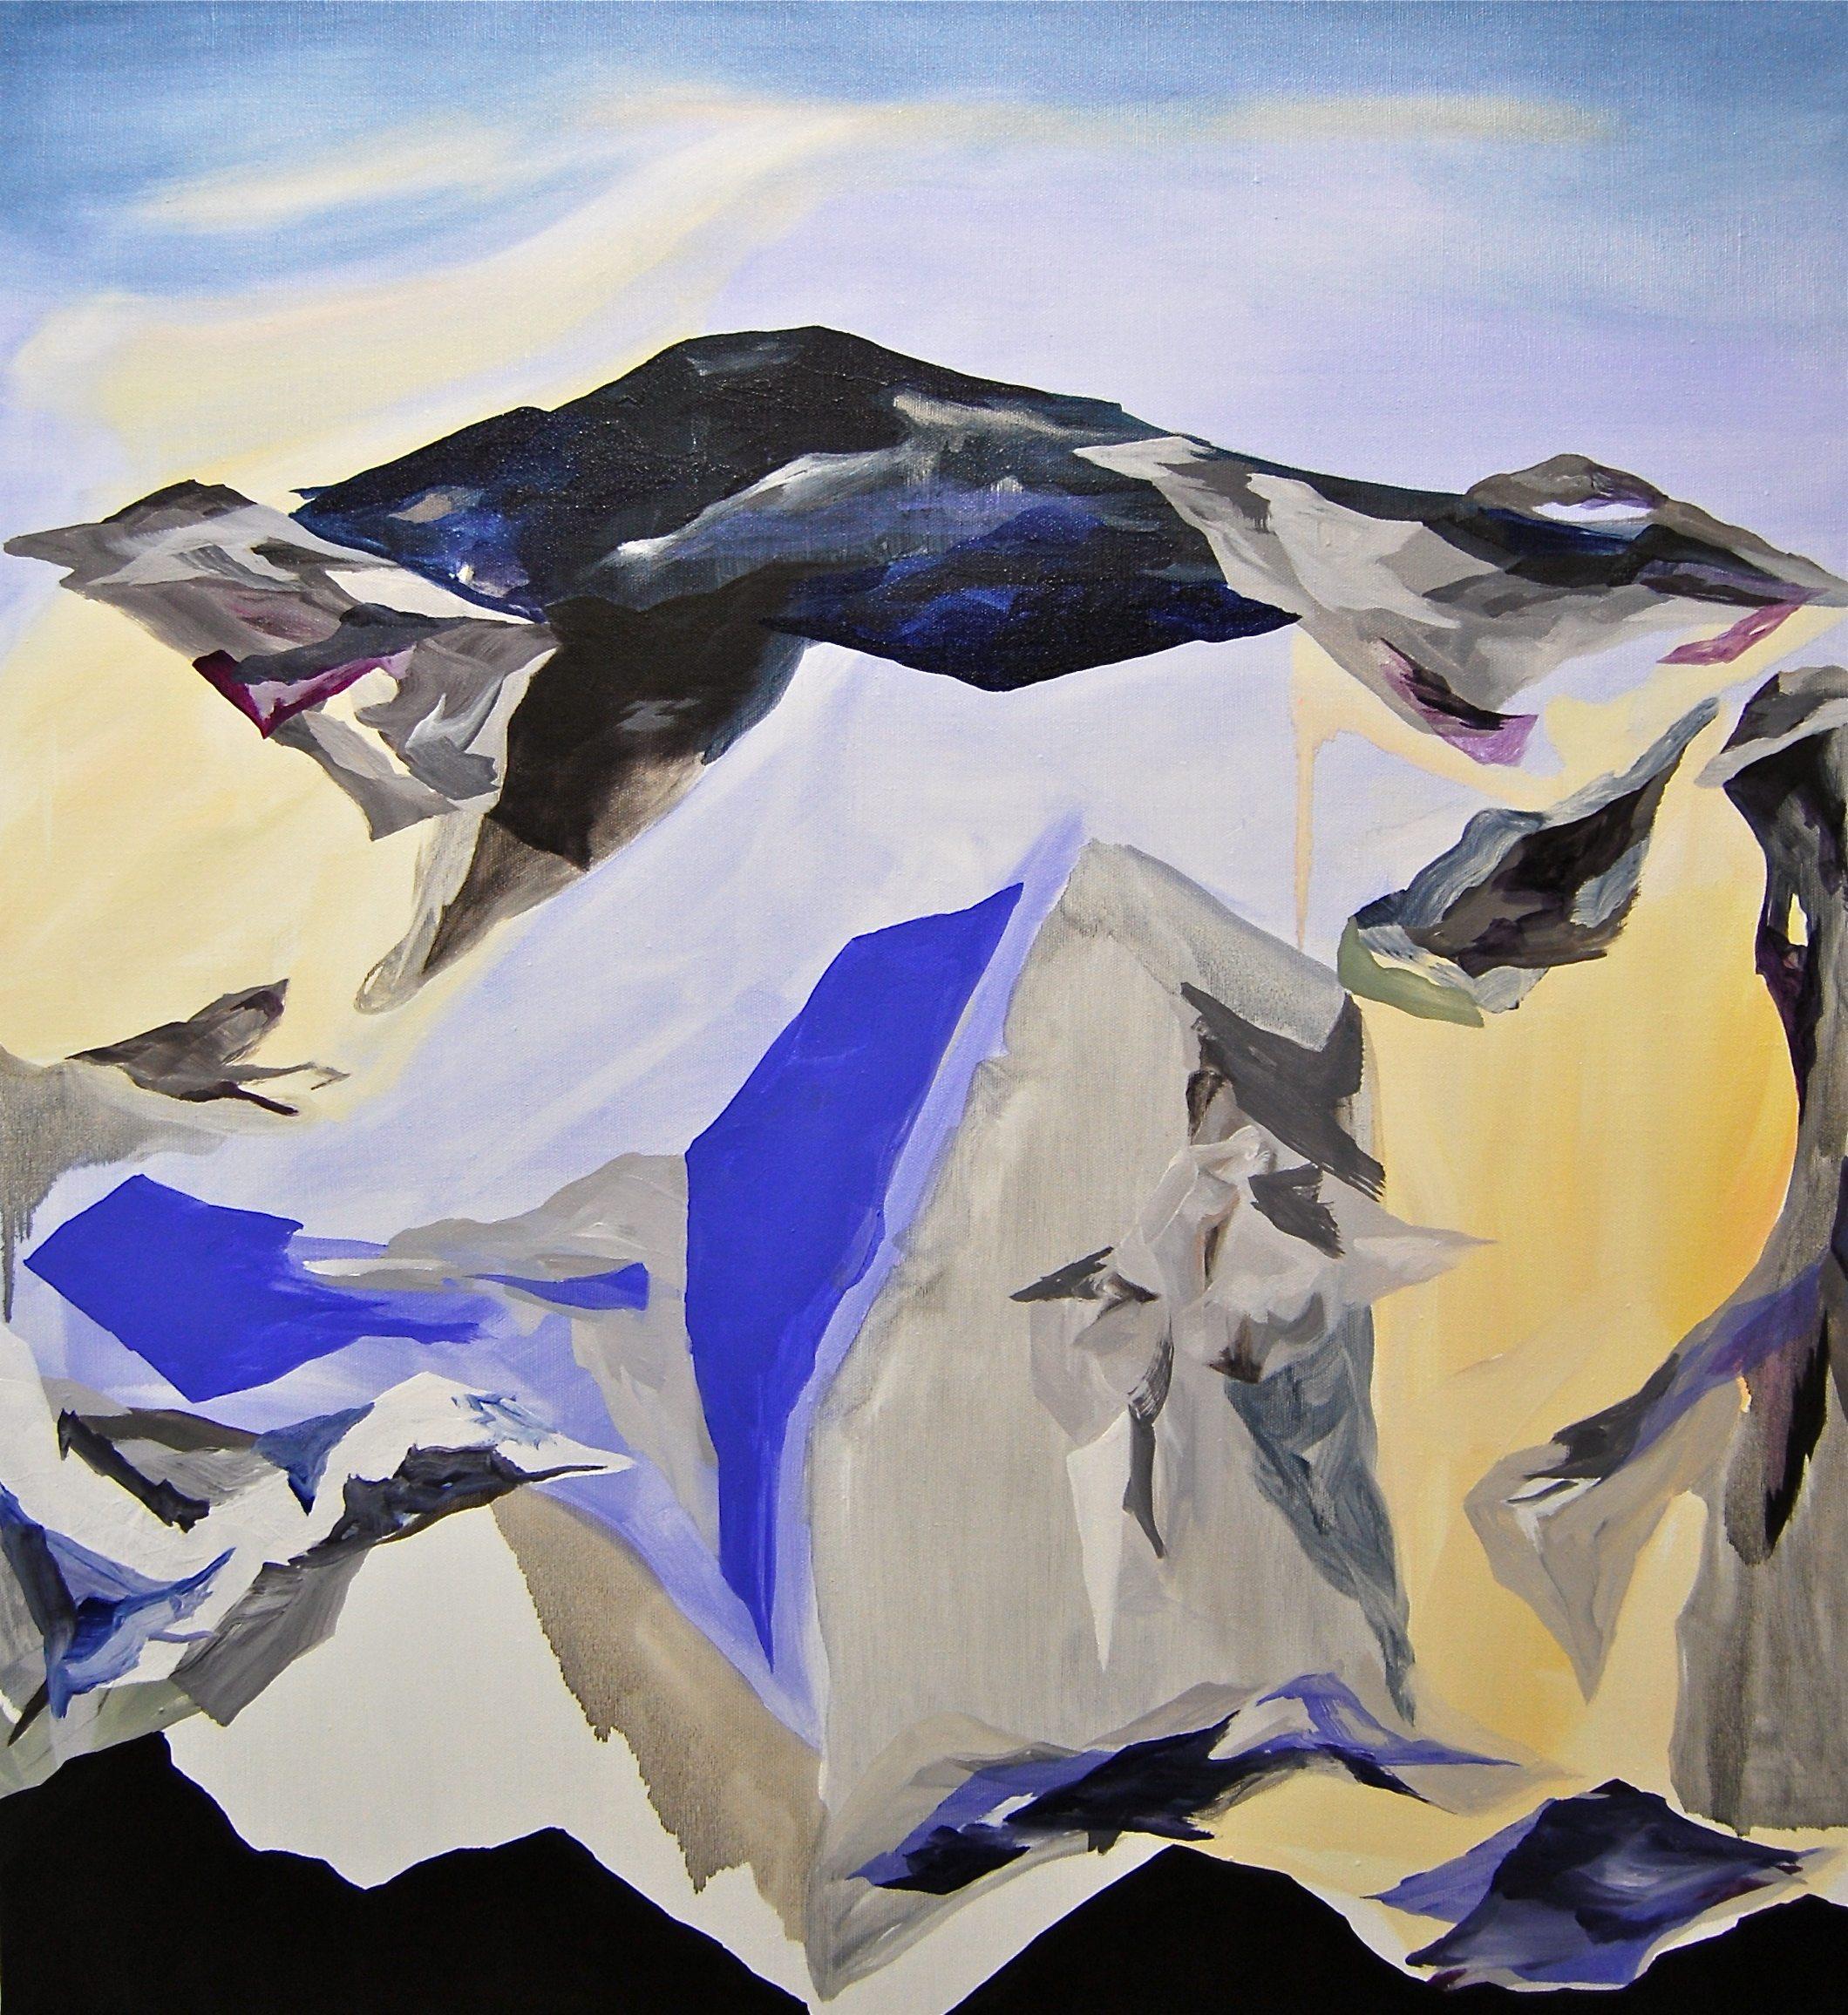 Rockridgeskyline, Oil on Canvas,  92 x 84 cm